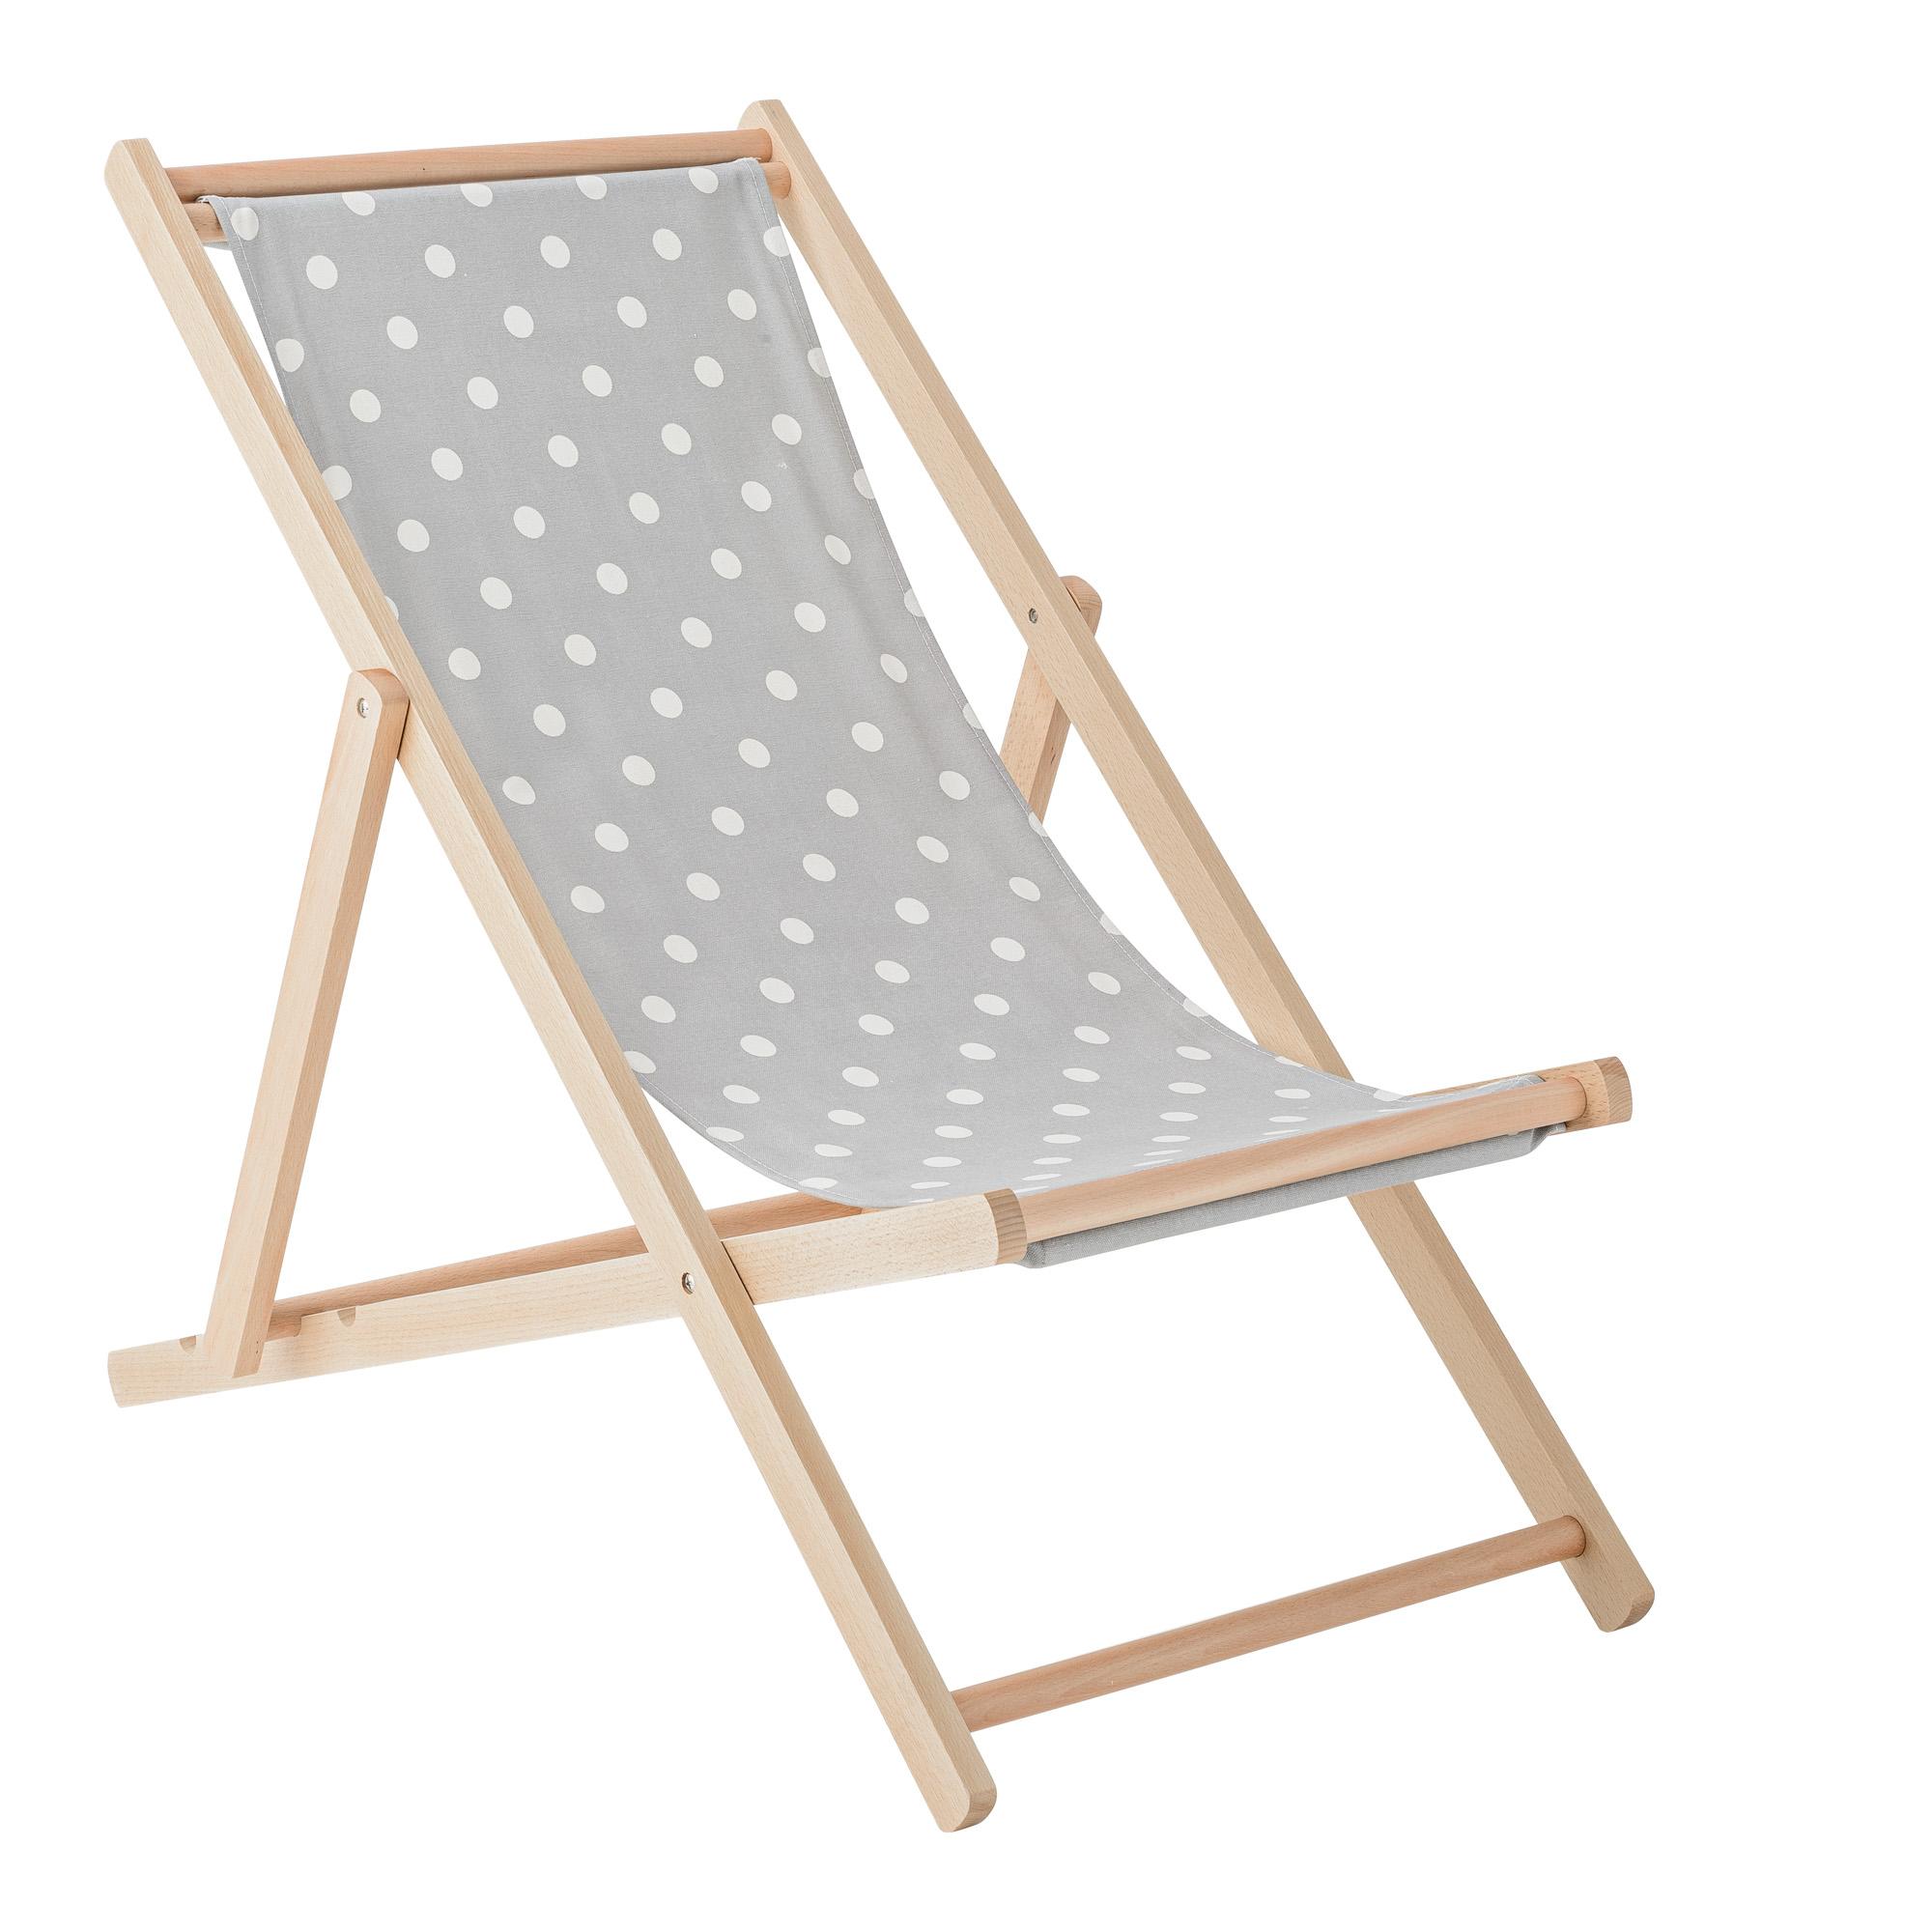 Sedia Sdraio Vintage.Deck Chair Grigio Pois Bianco